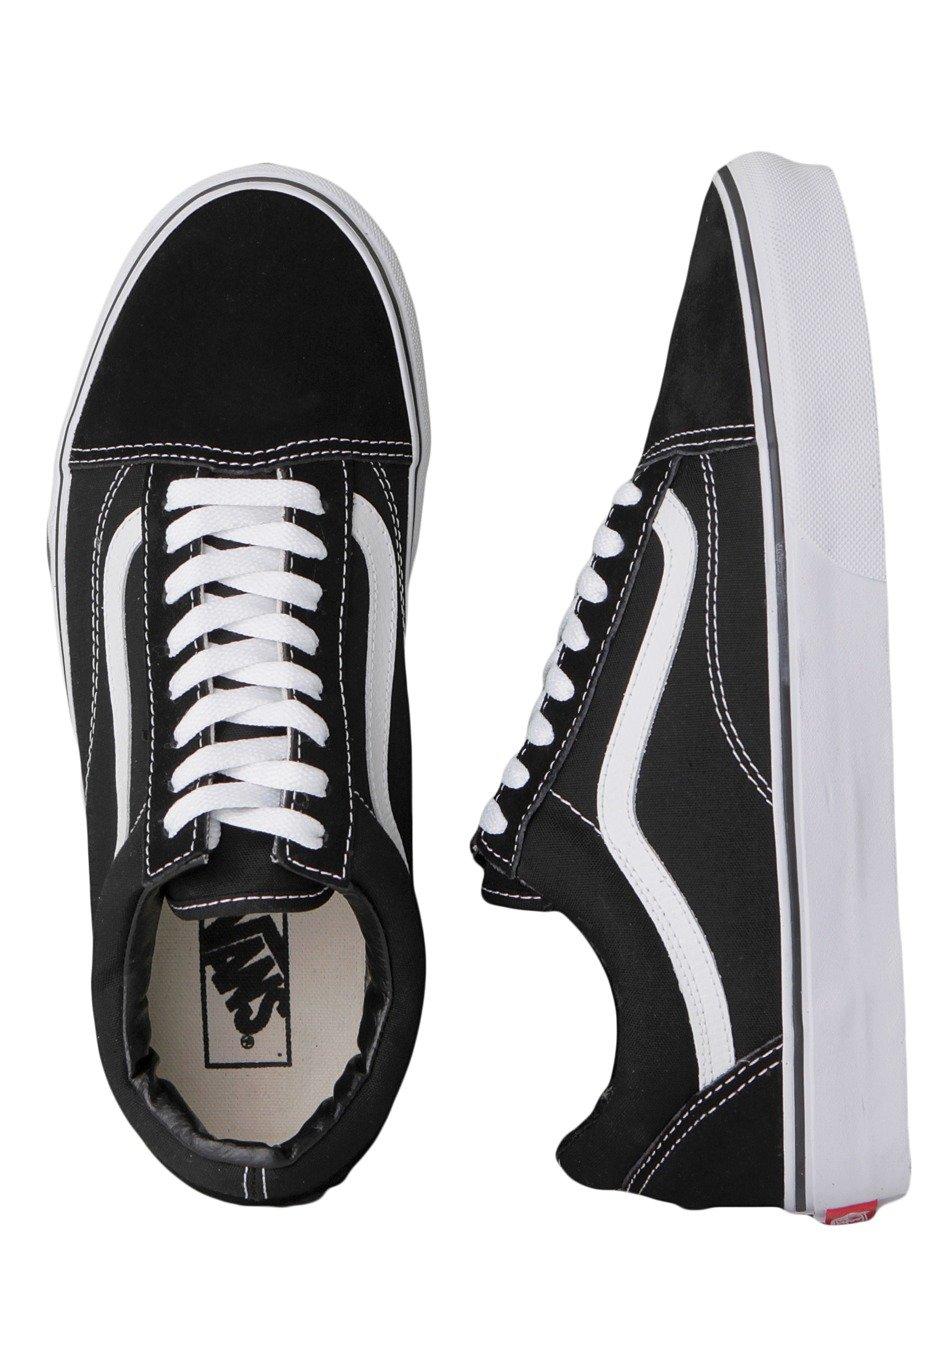 Vans - Old Skool Black/White - Skate Shoes